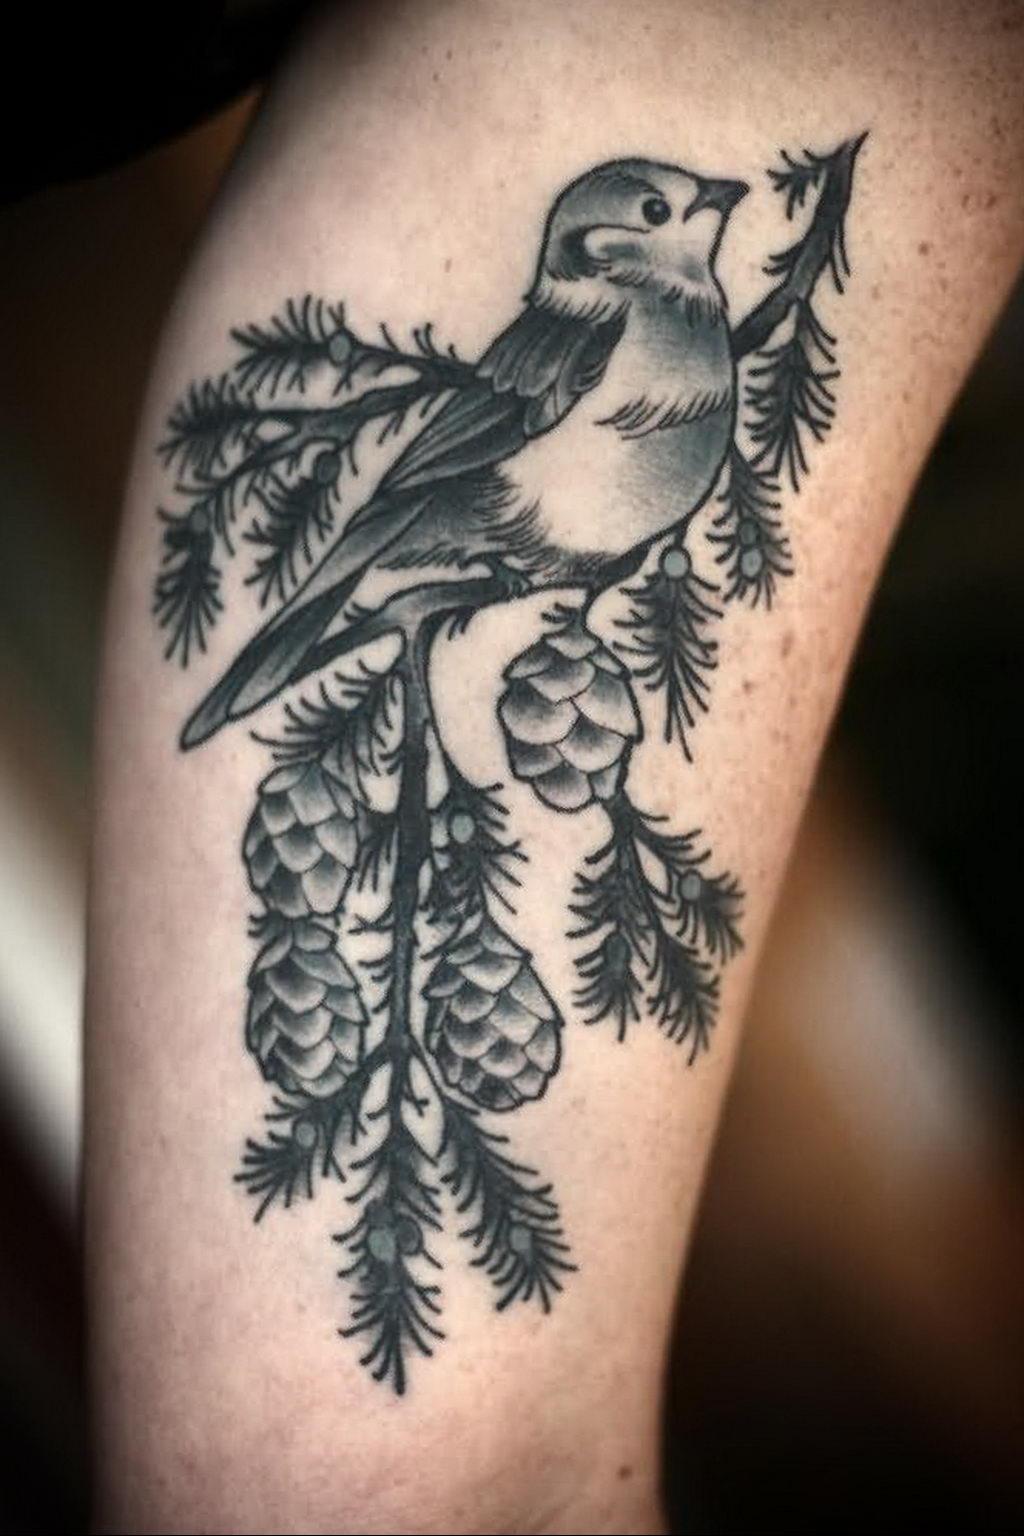 Фото тату про любовь рисунок Птица 03.02.2020 №175 -bird tattoo- tatufoto.com